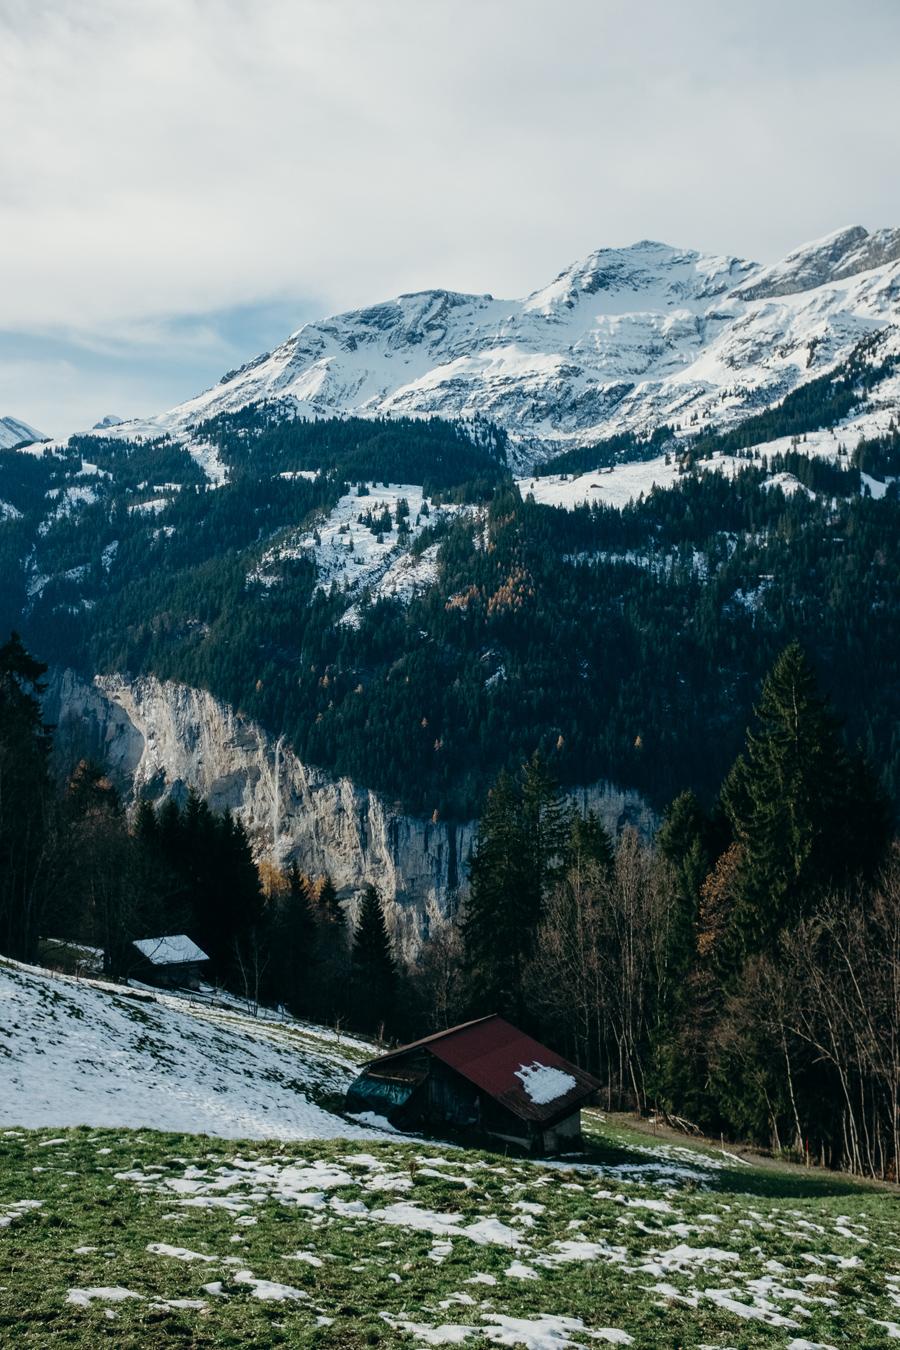 039-switzerland-mountains-snow-travel-photography.jpg